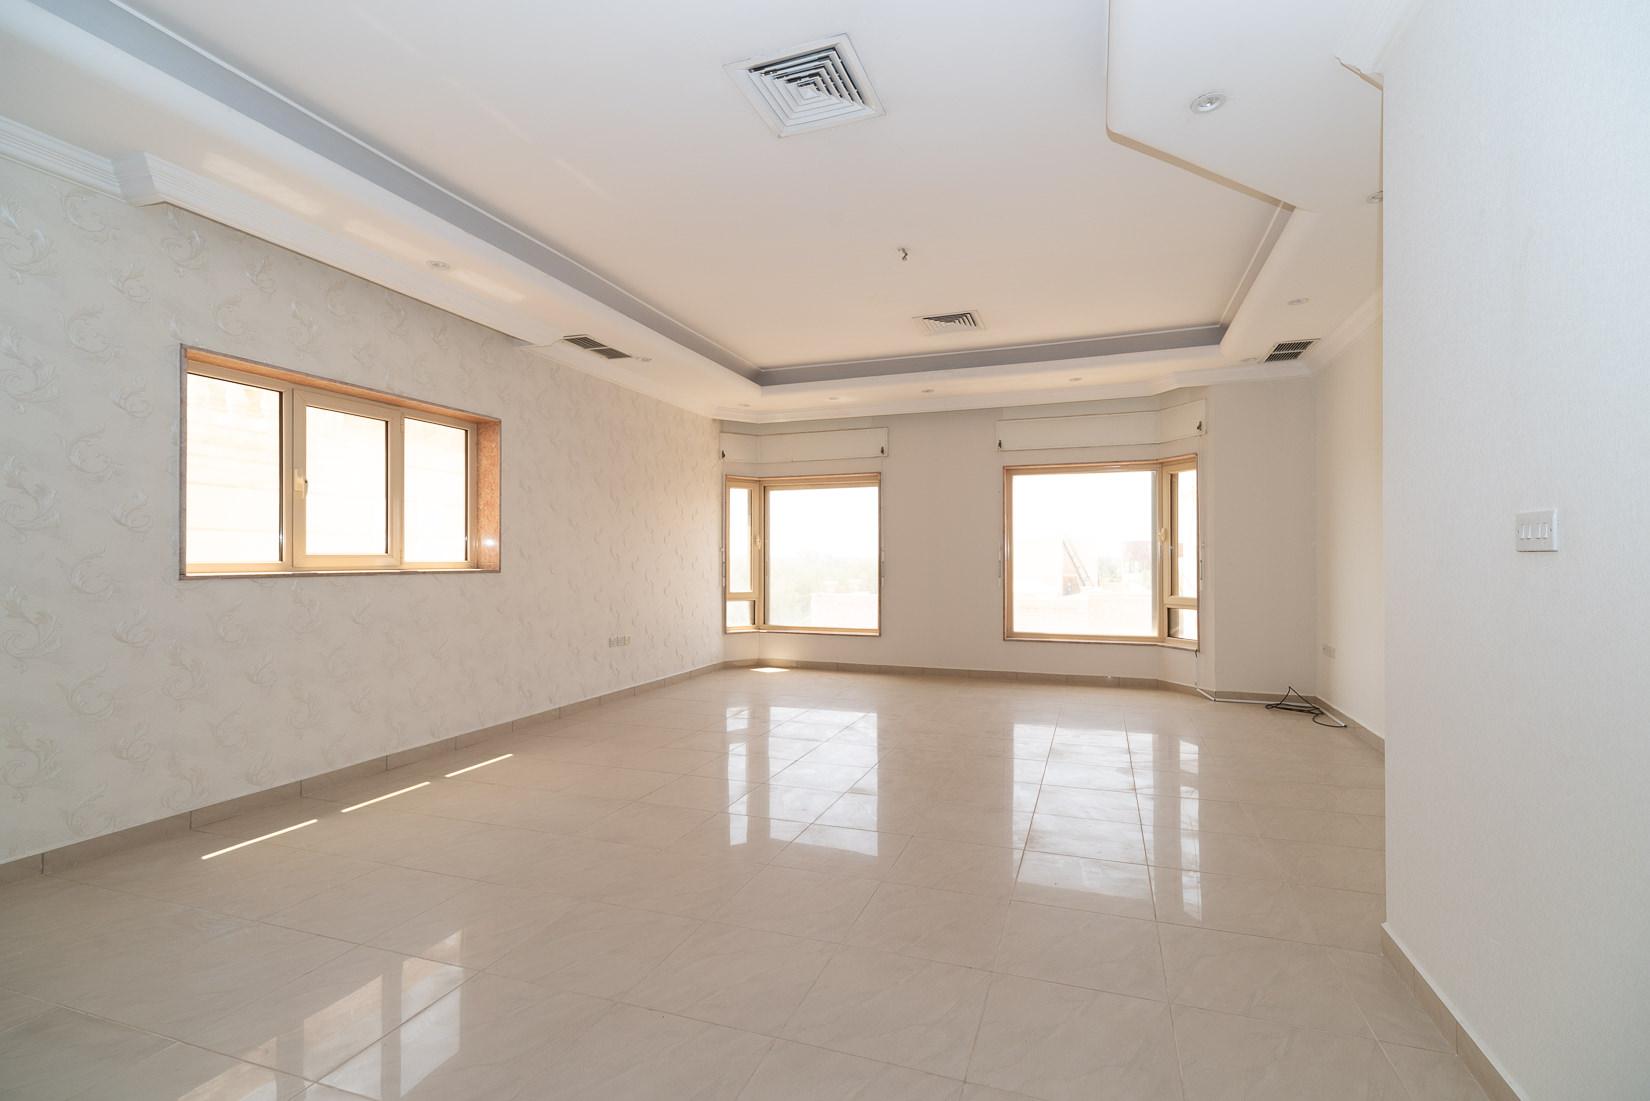 Salwa – spacious, ufnurnished four bedroom floor